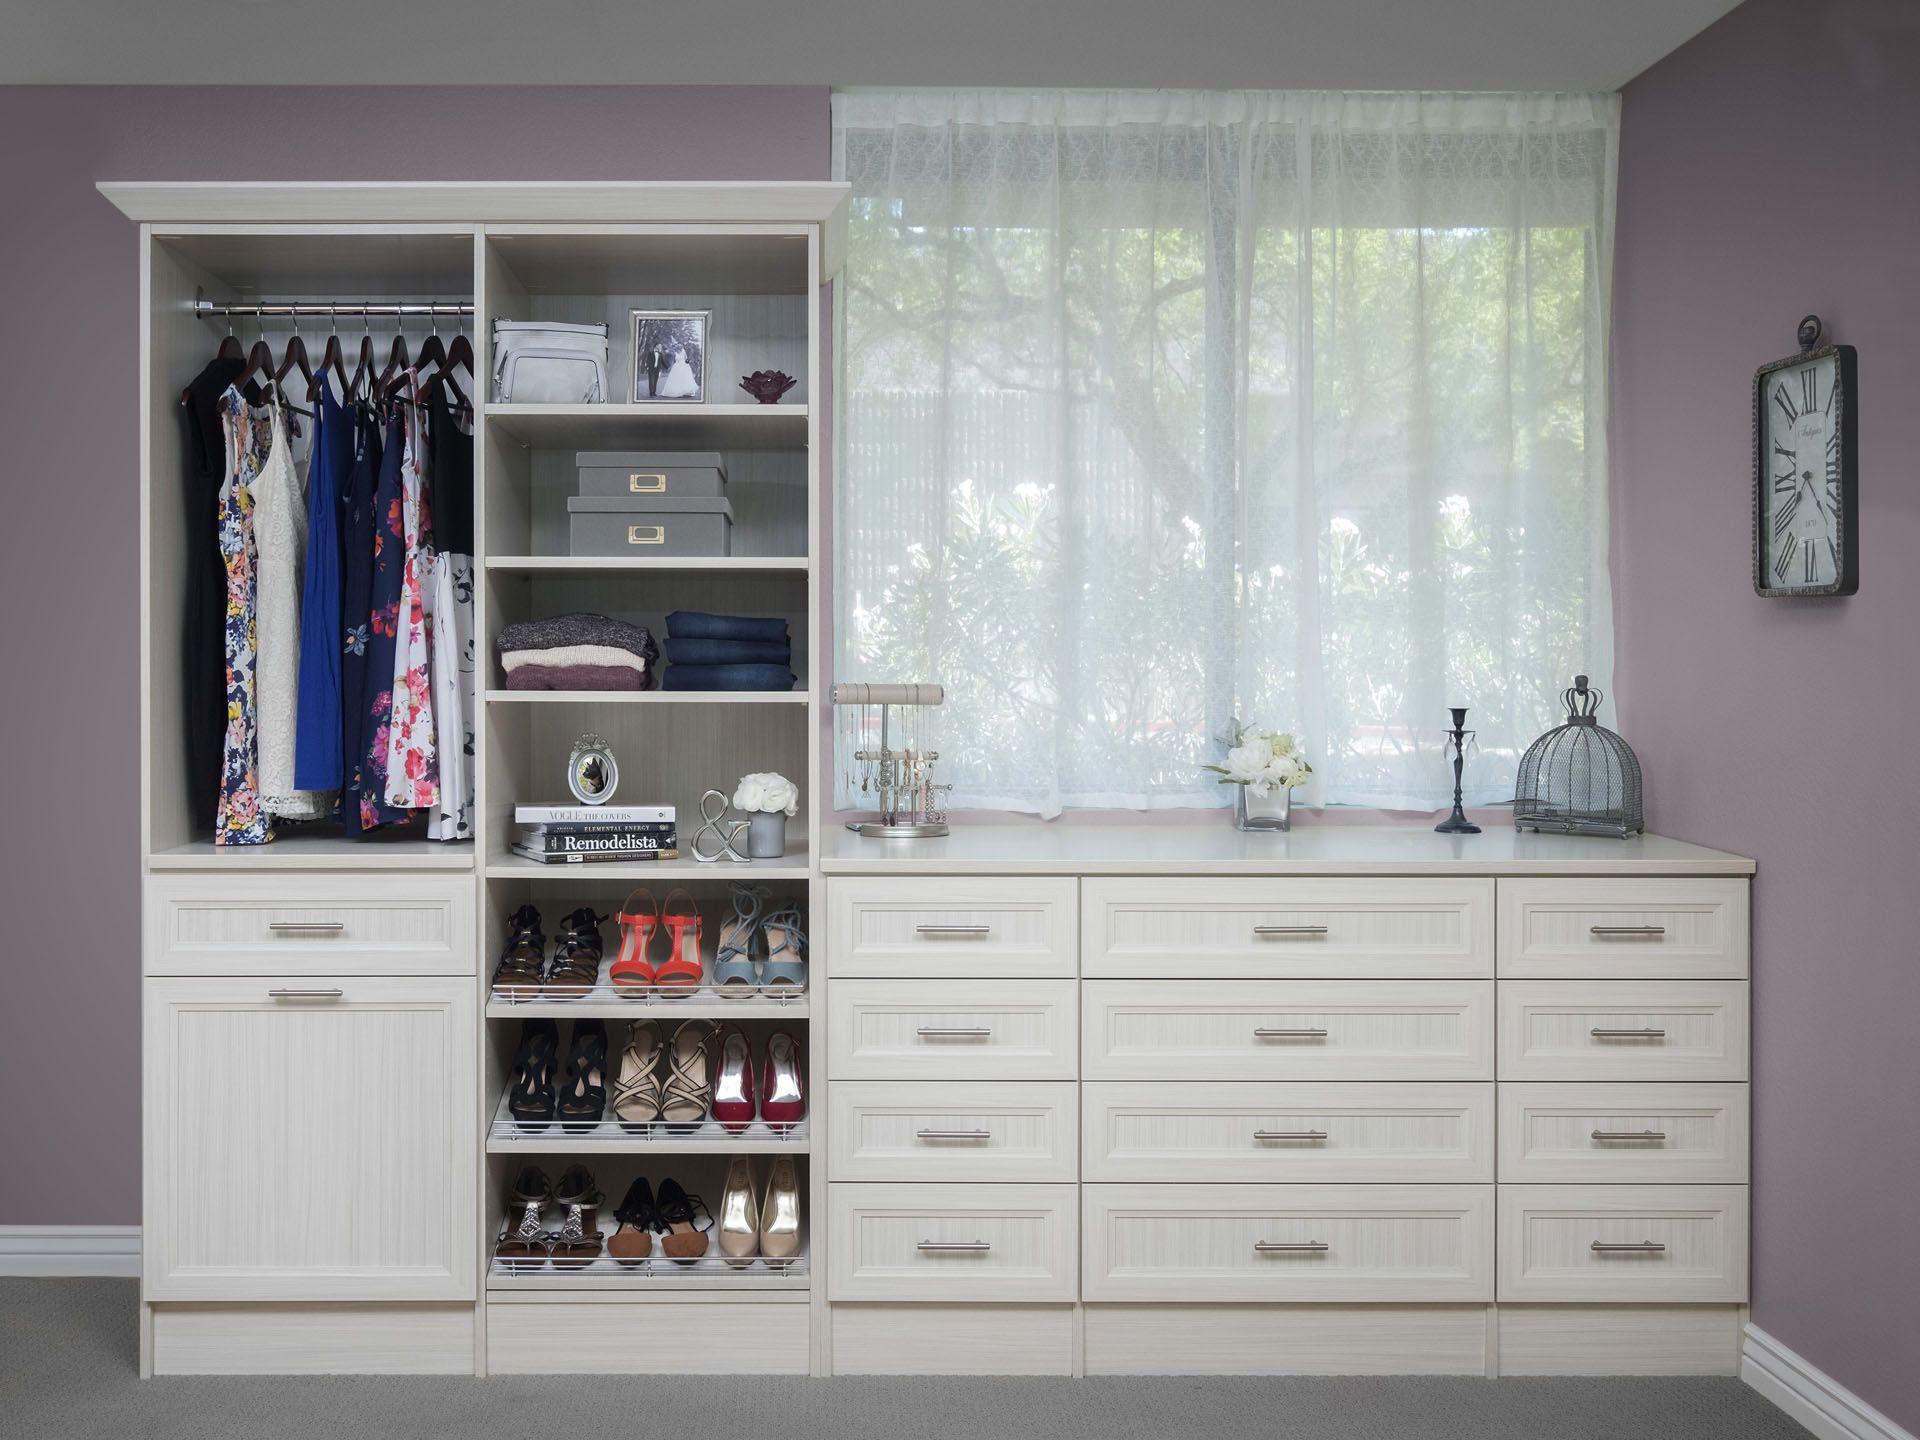 Custom Closets In 2020 With Images Clever Closet Custom Closets Closet Design